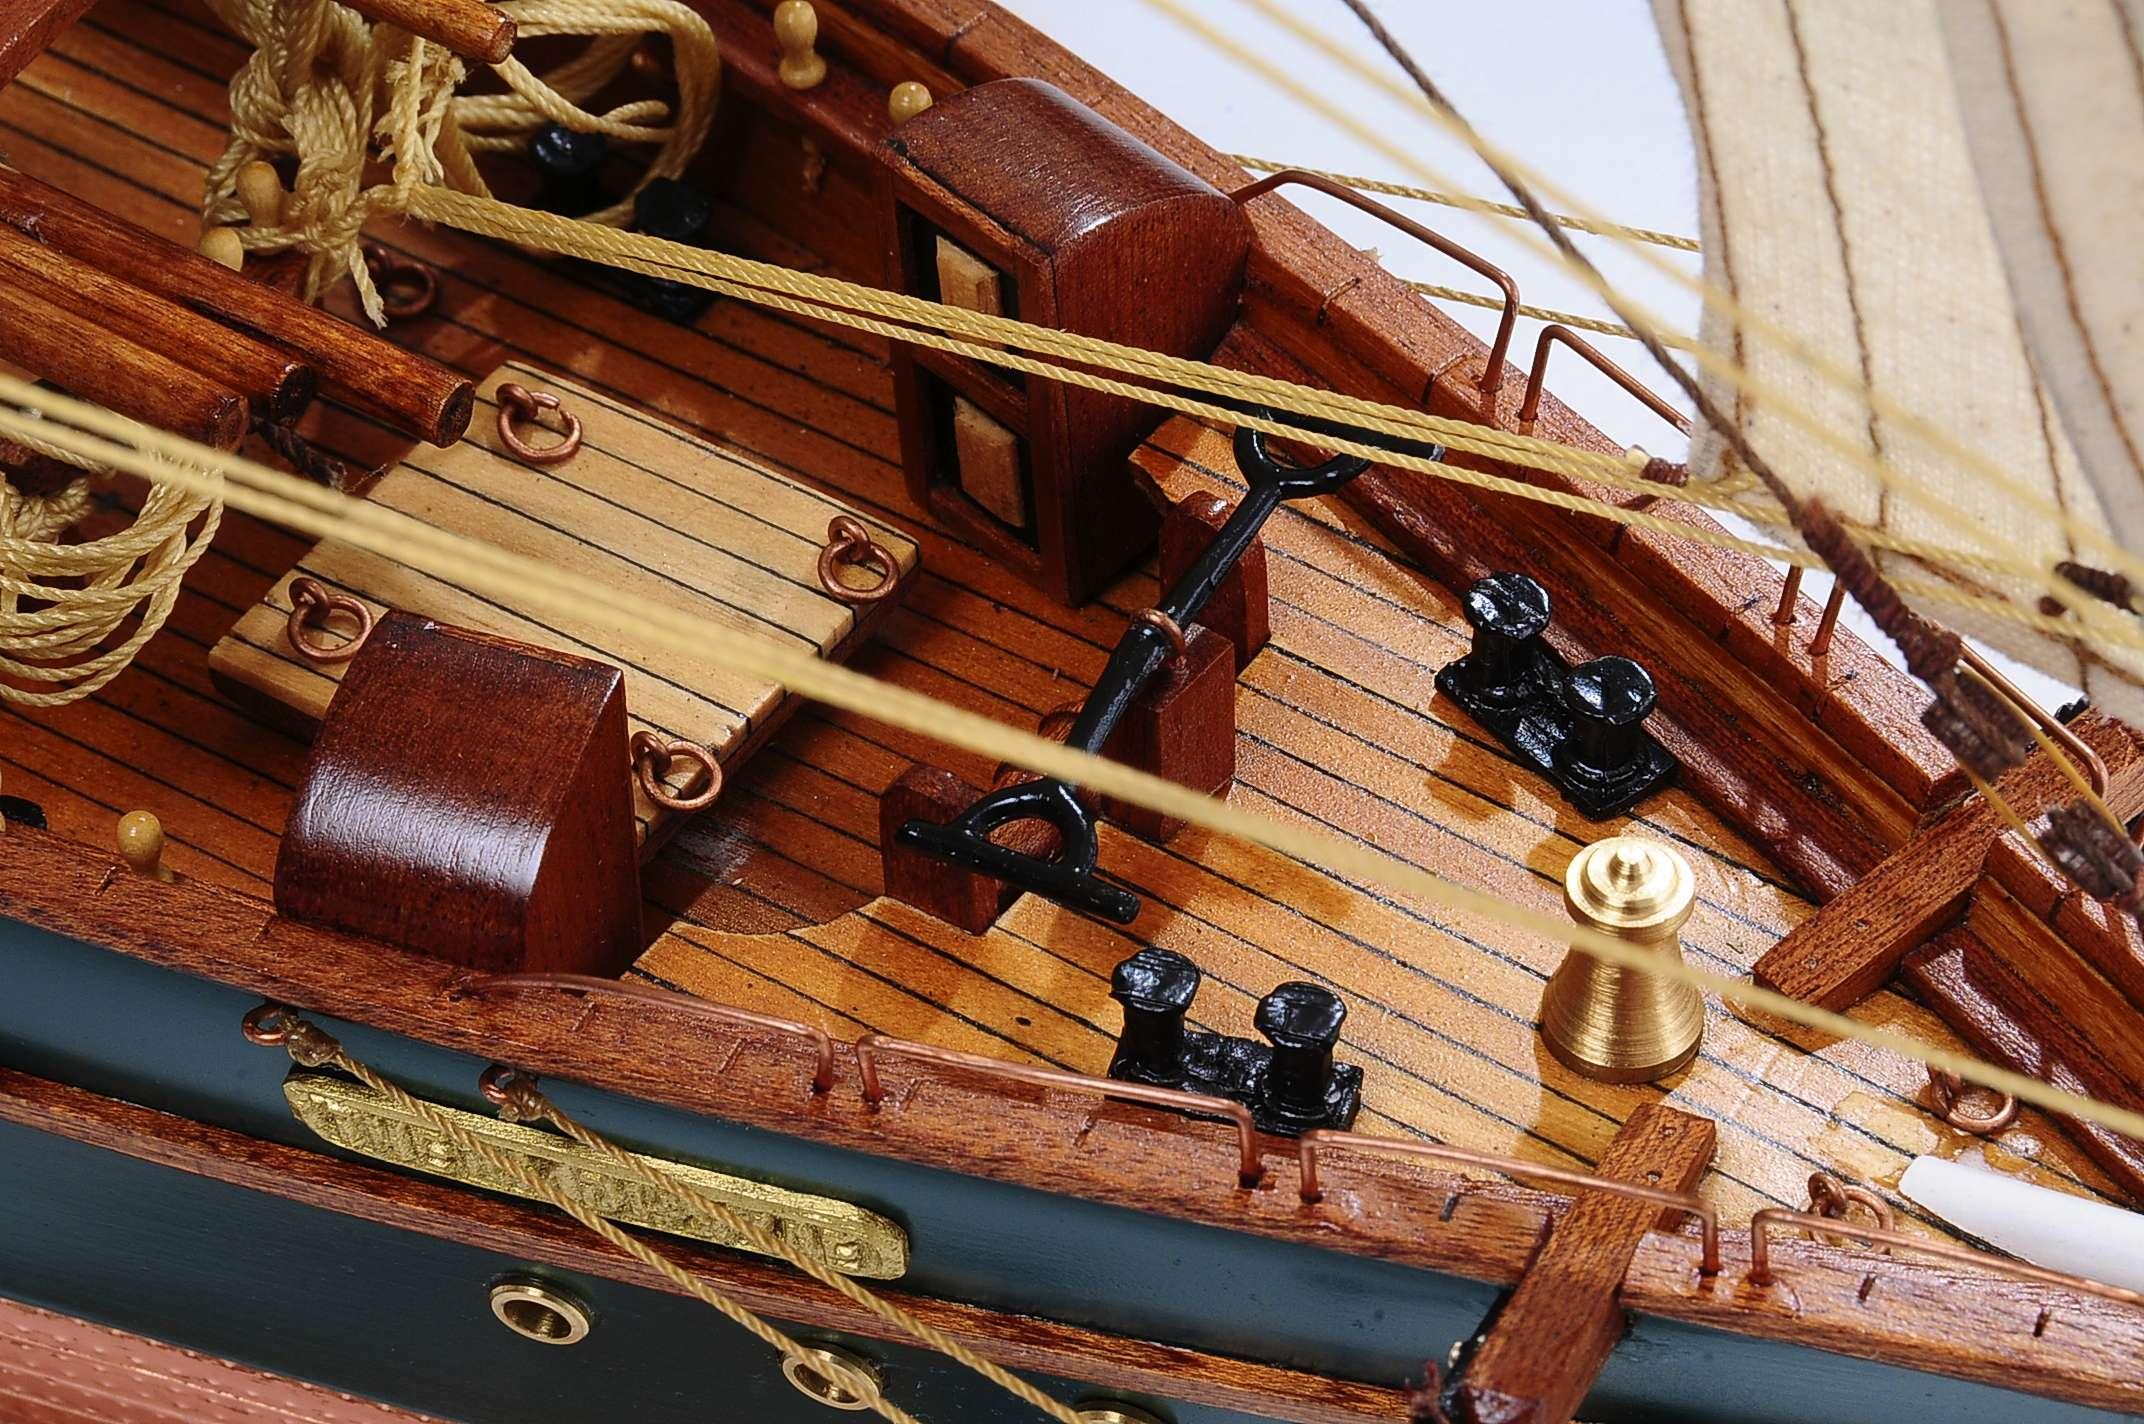 1434-4868-Thermopylae-Model-Boat